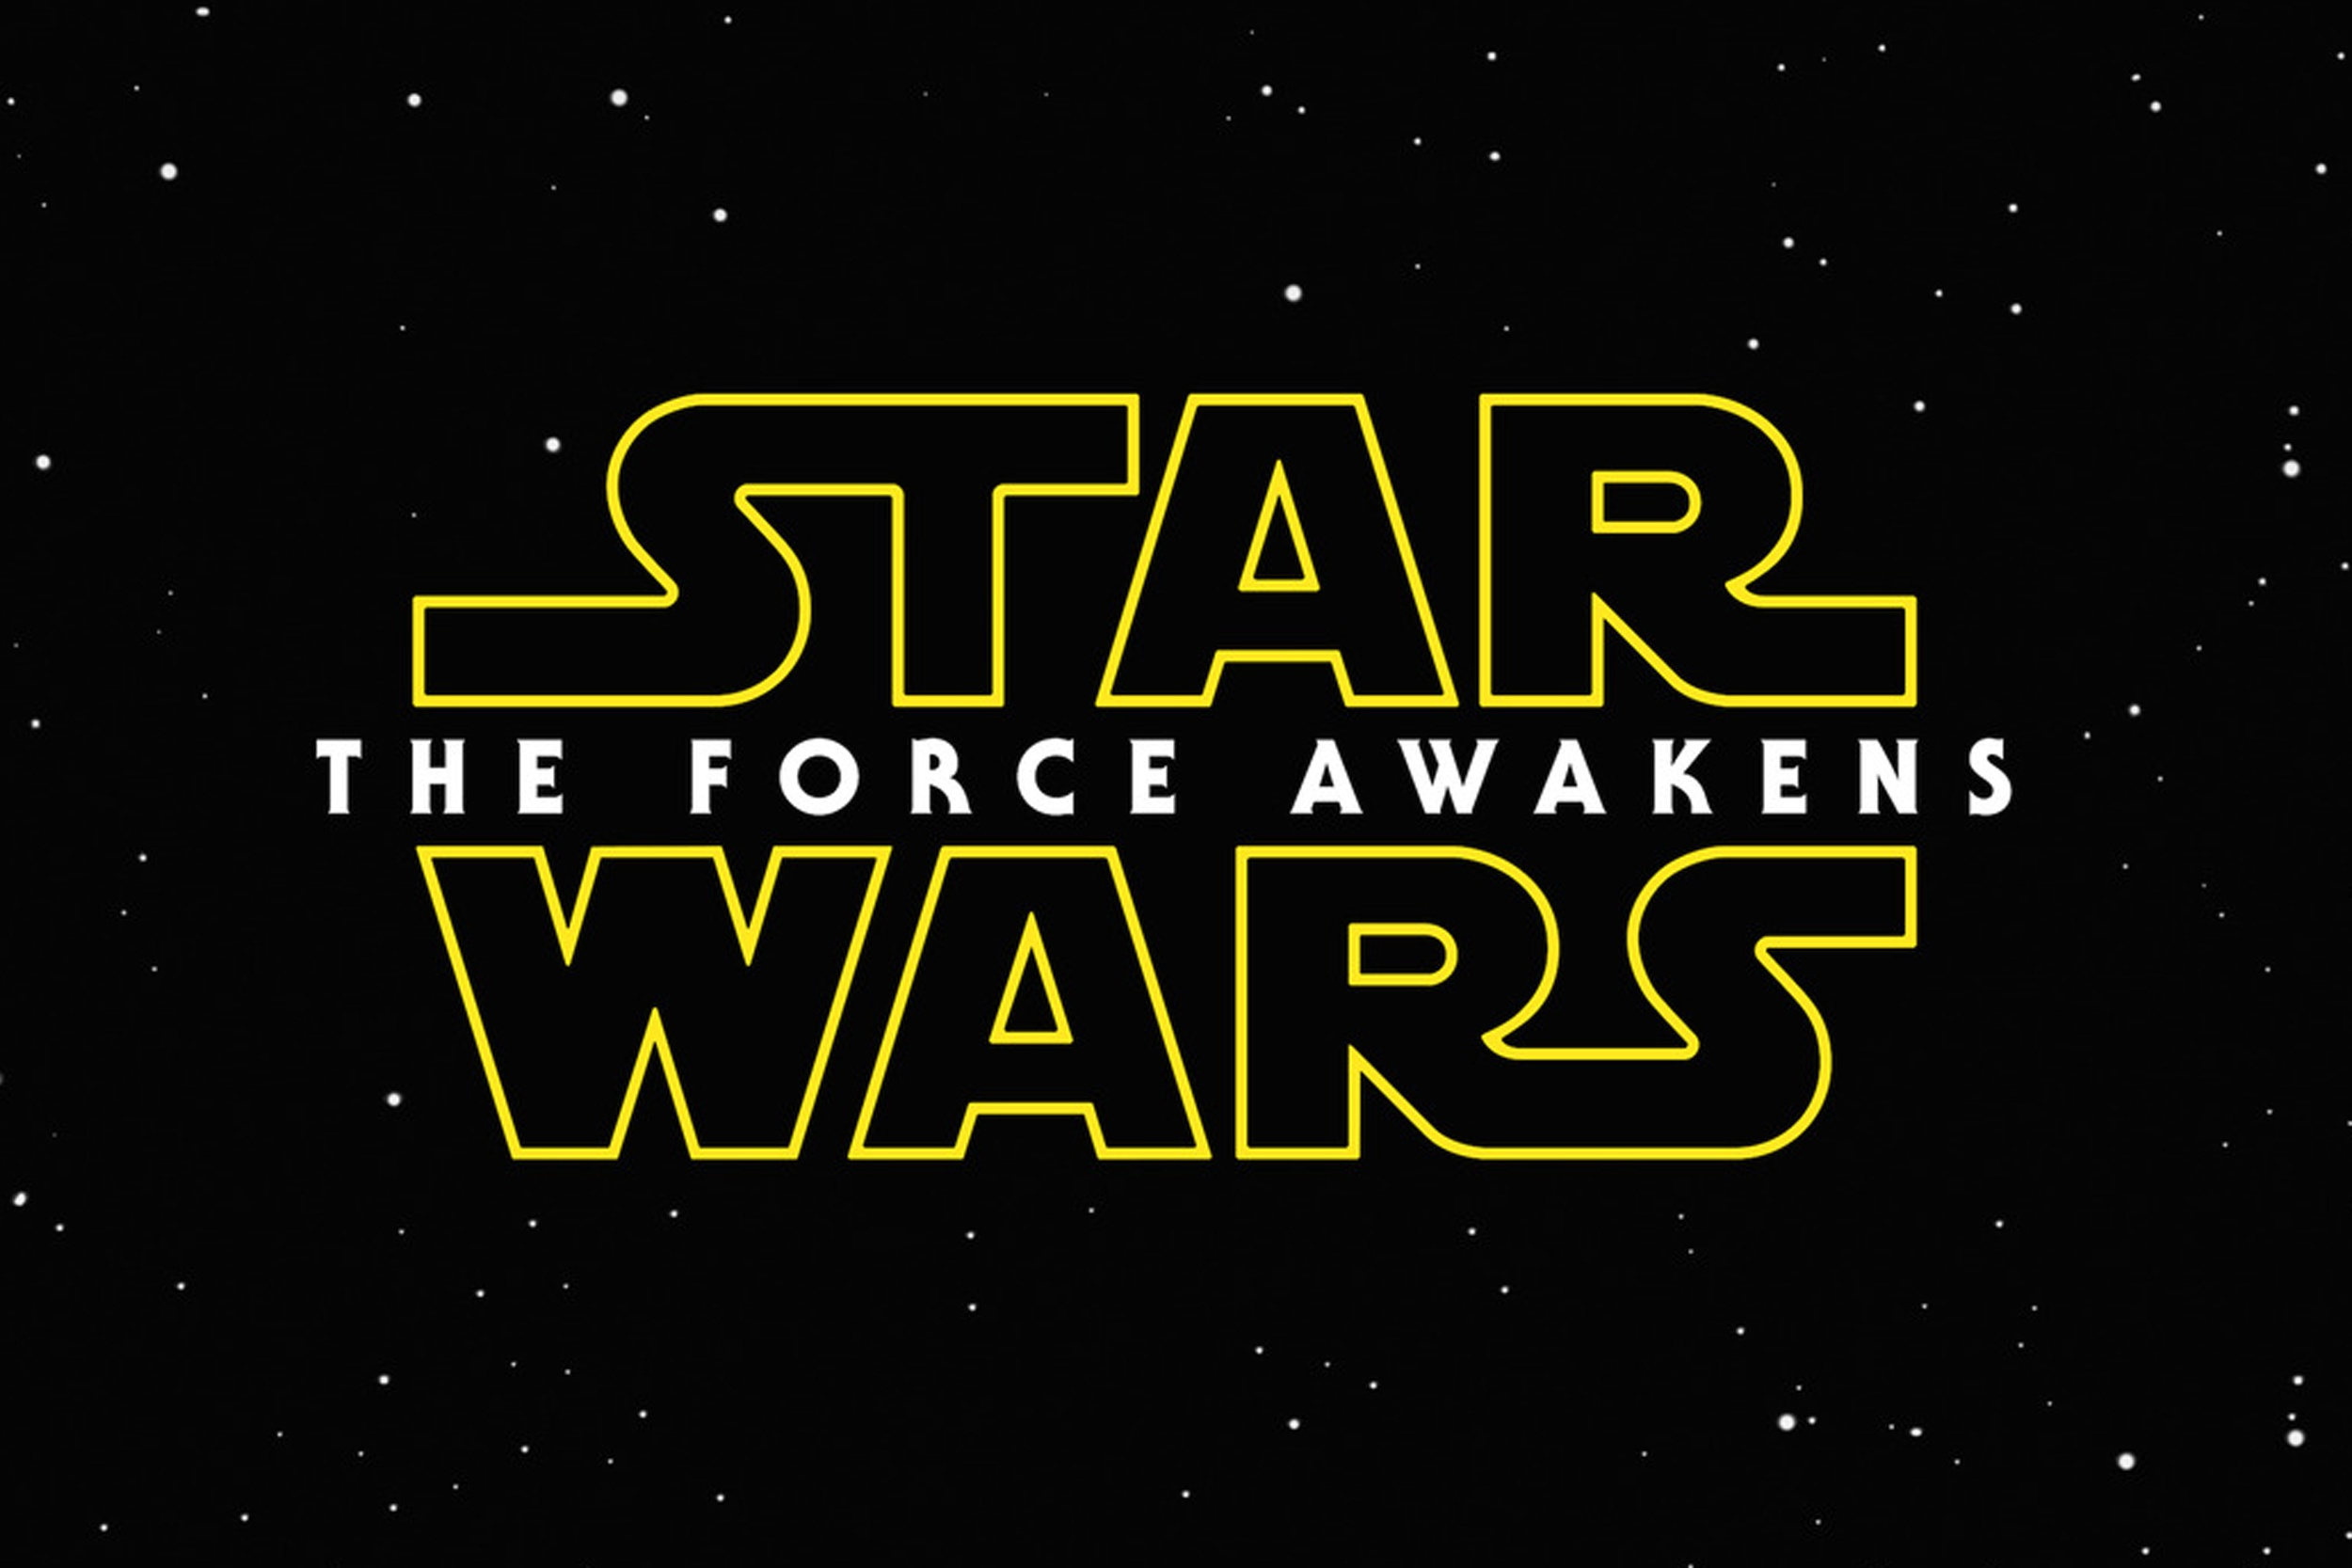 8da48983bc796813542e_edbd2adbd8f6208f182a_Star-Wars-The-Force-Awakens.jpg